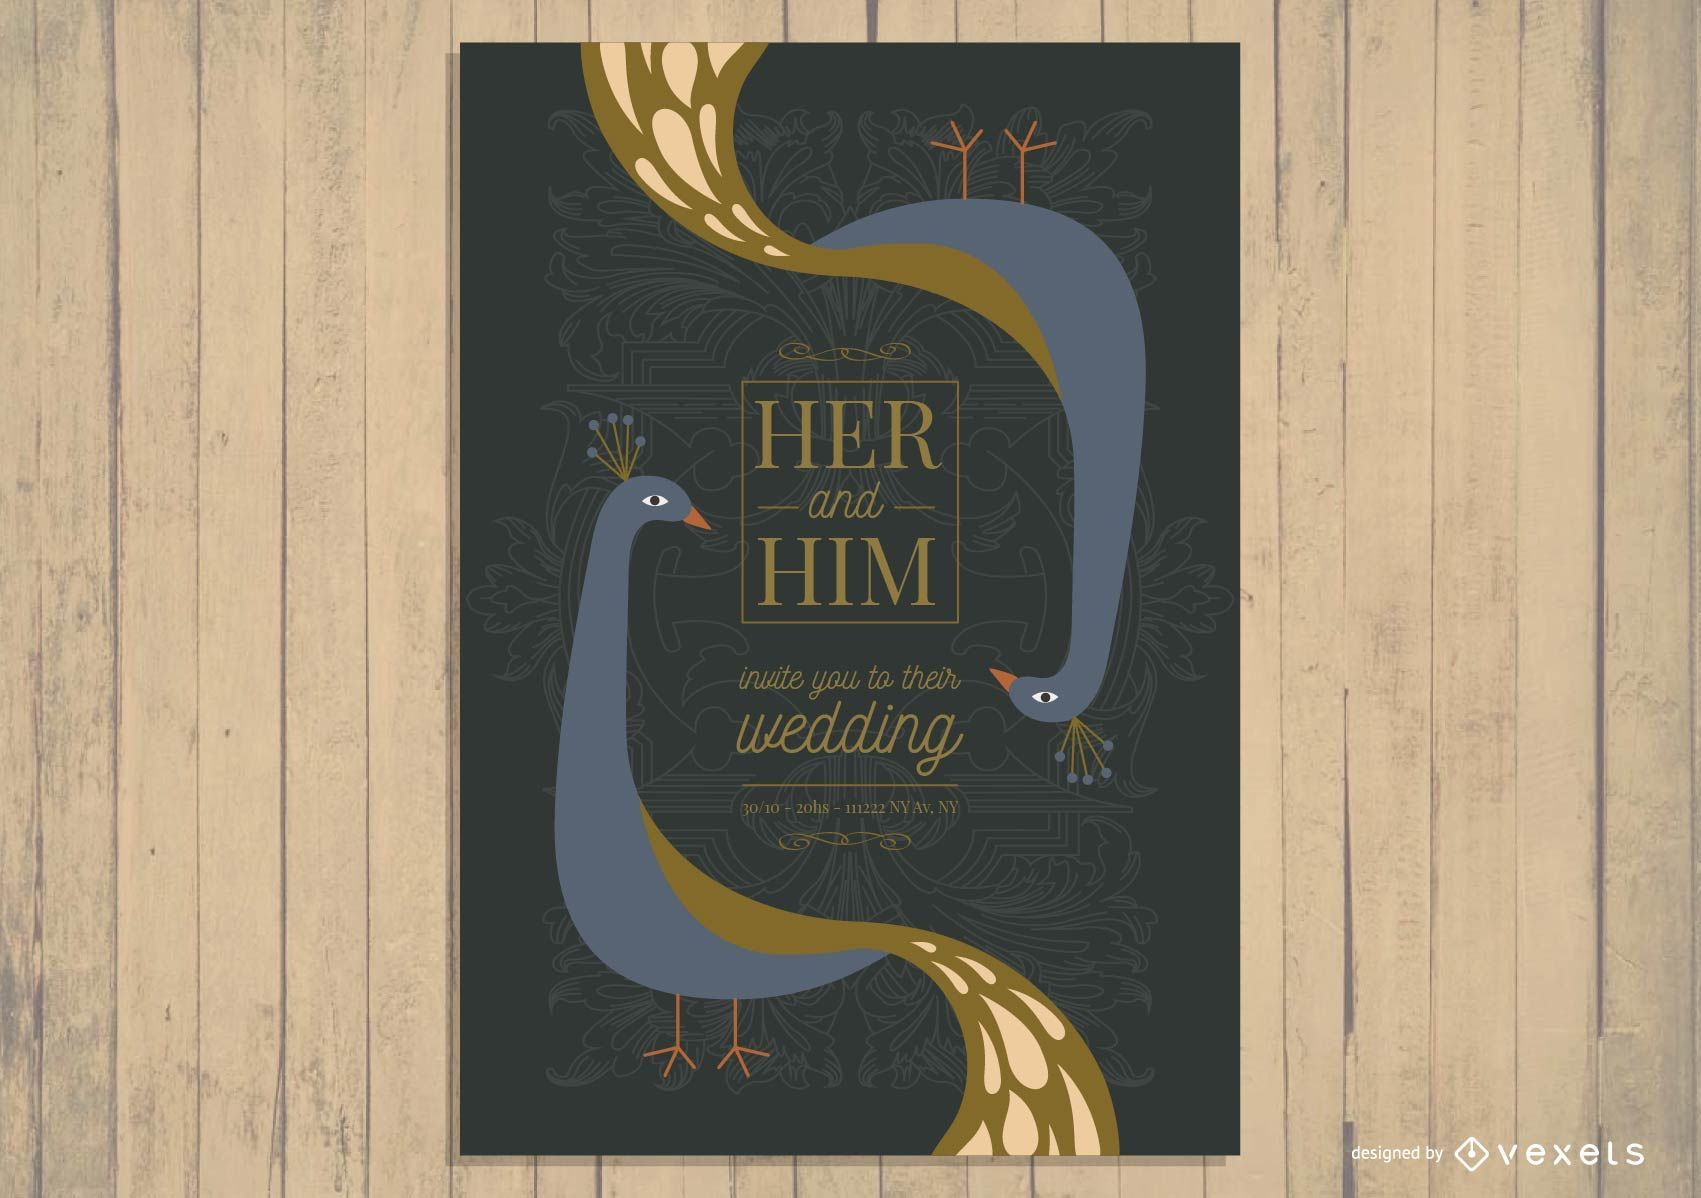 Asian Wedding Card Invitation Design